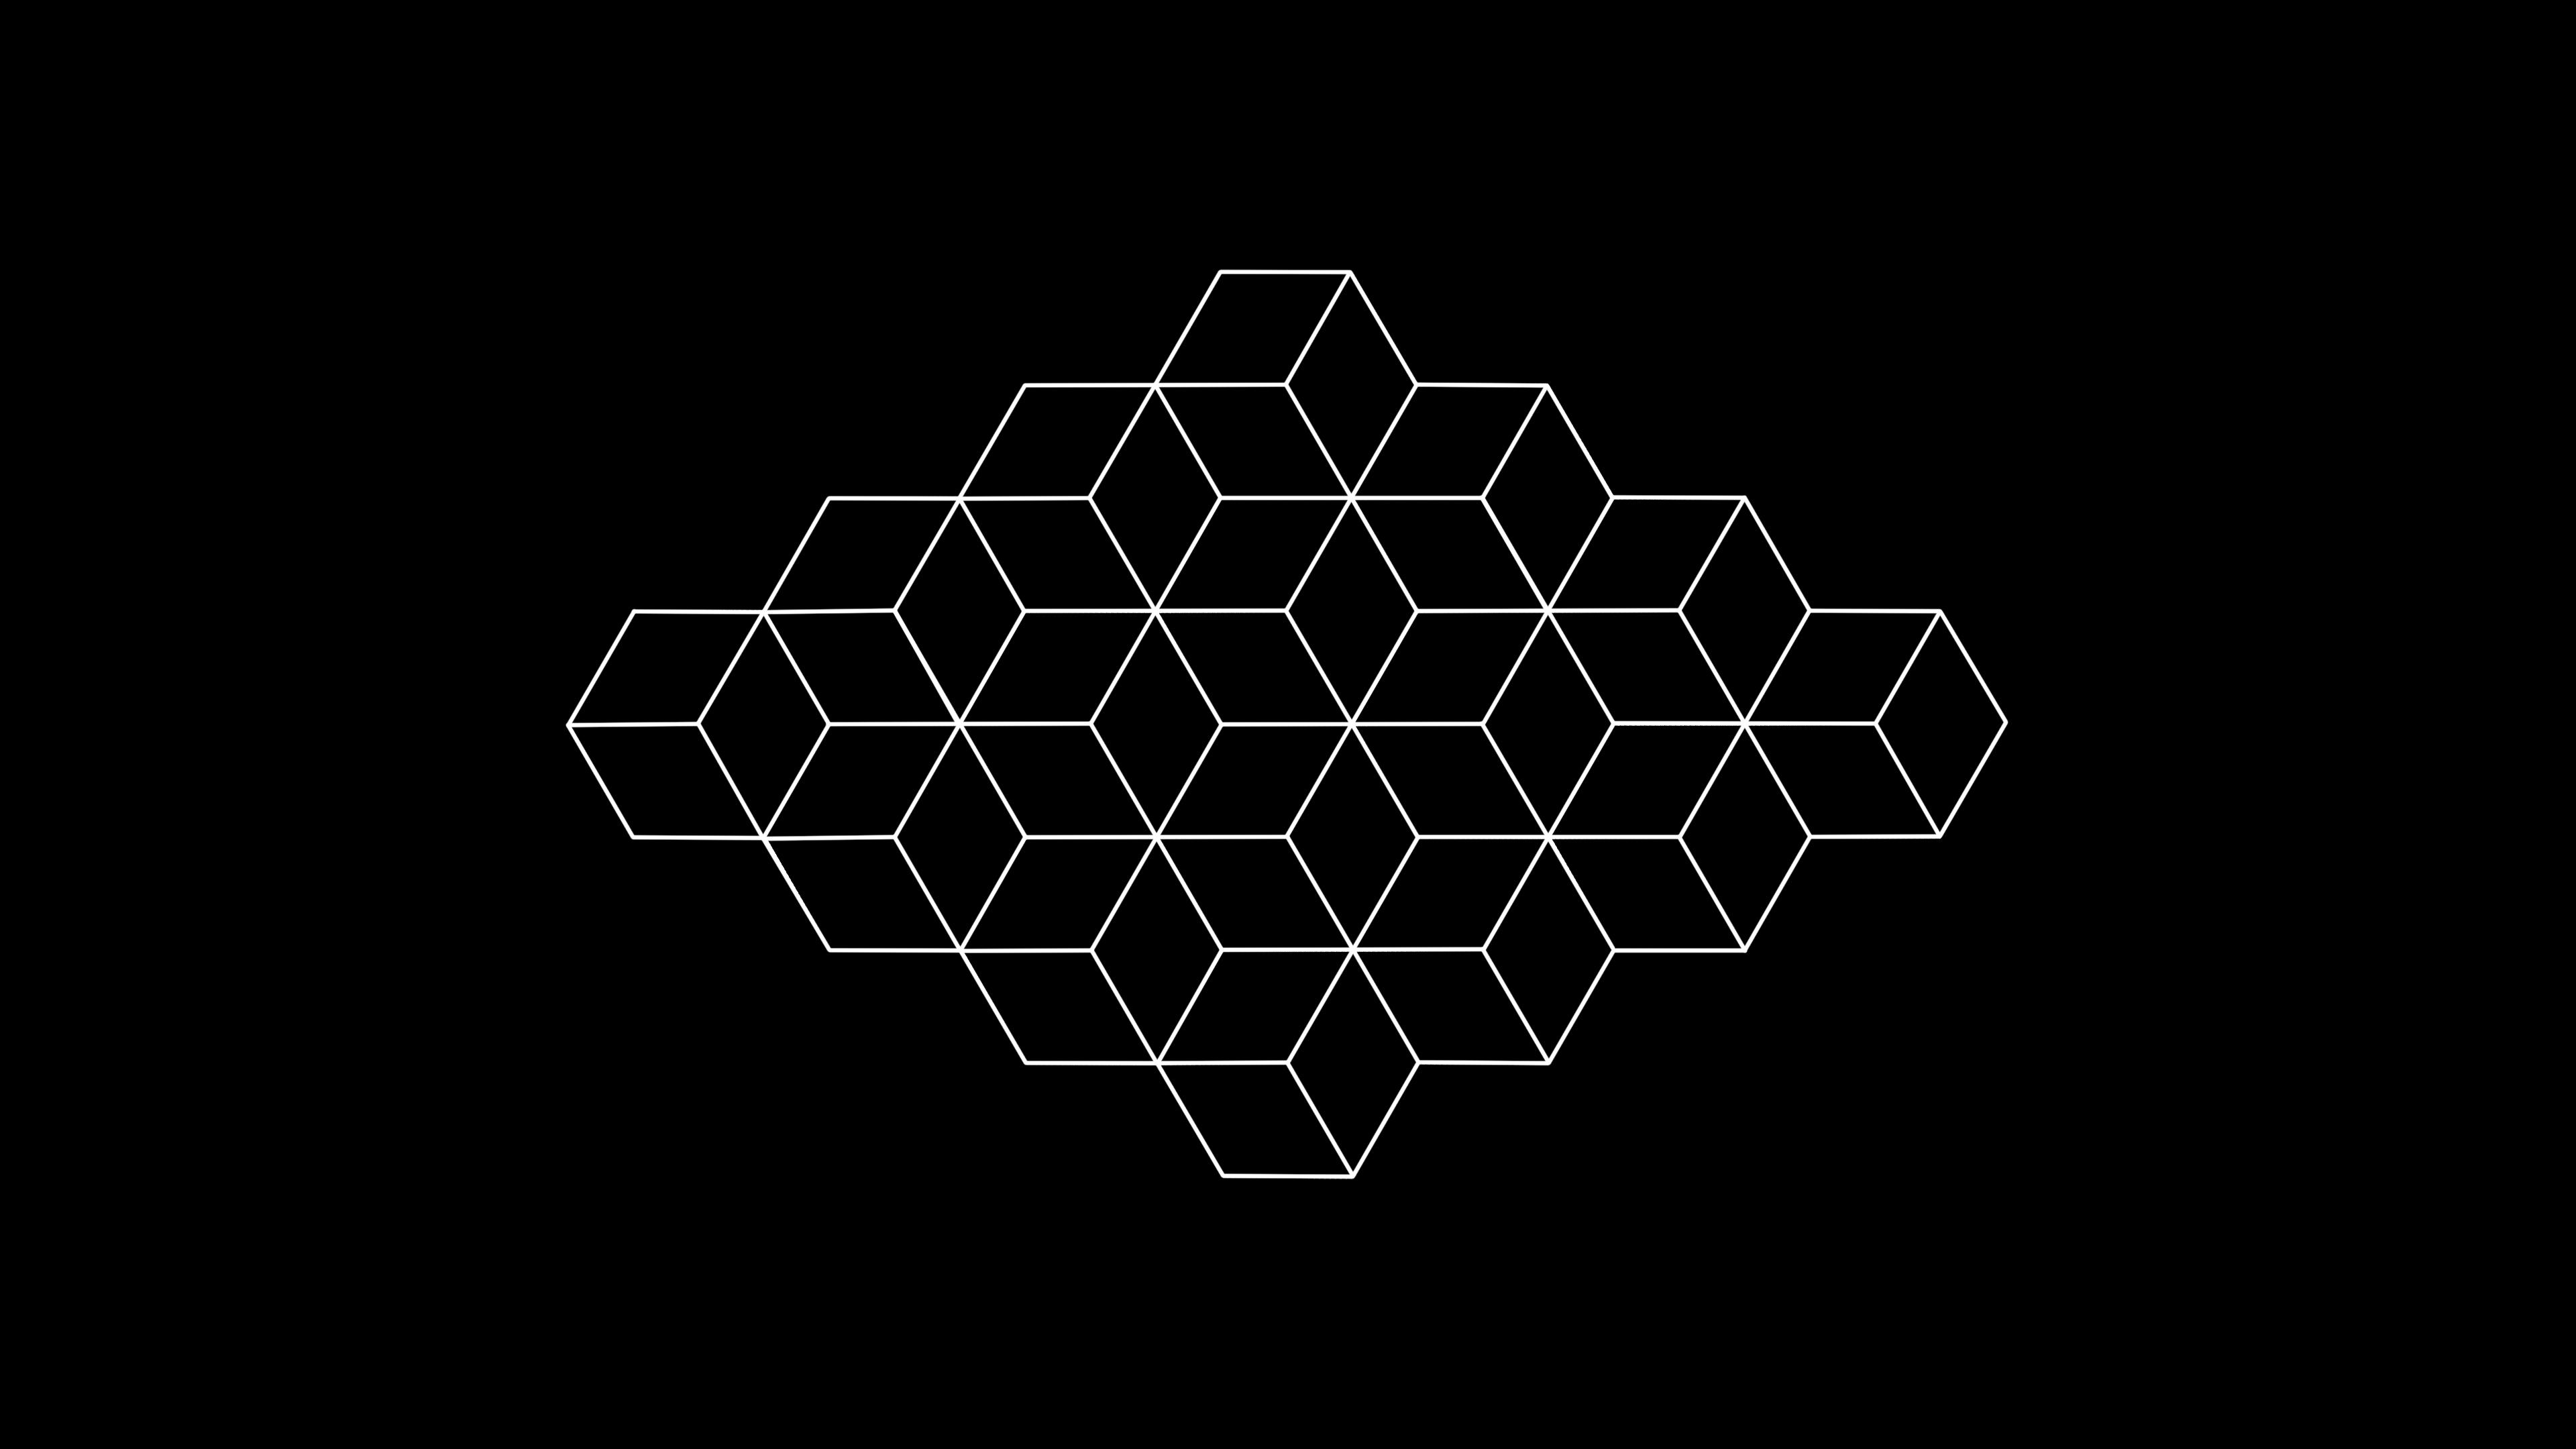 General 3840x2160 abstract shapes geometry geometric figures digital art